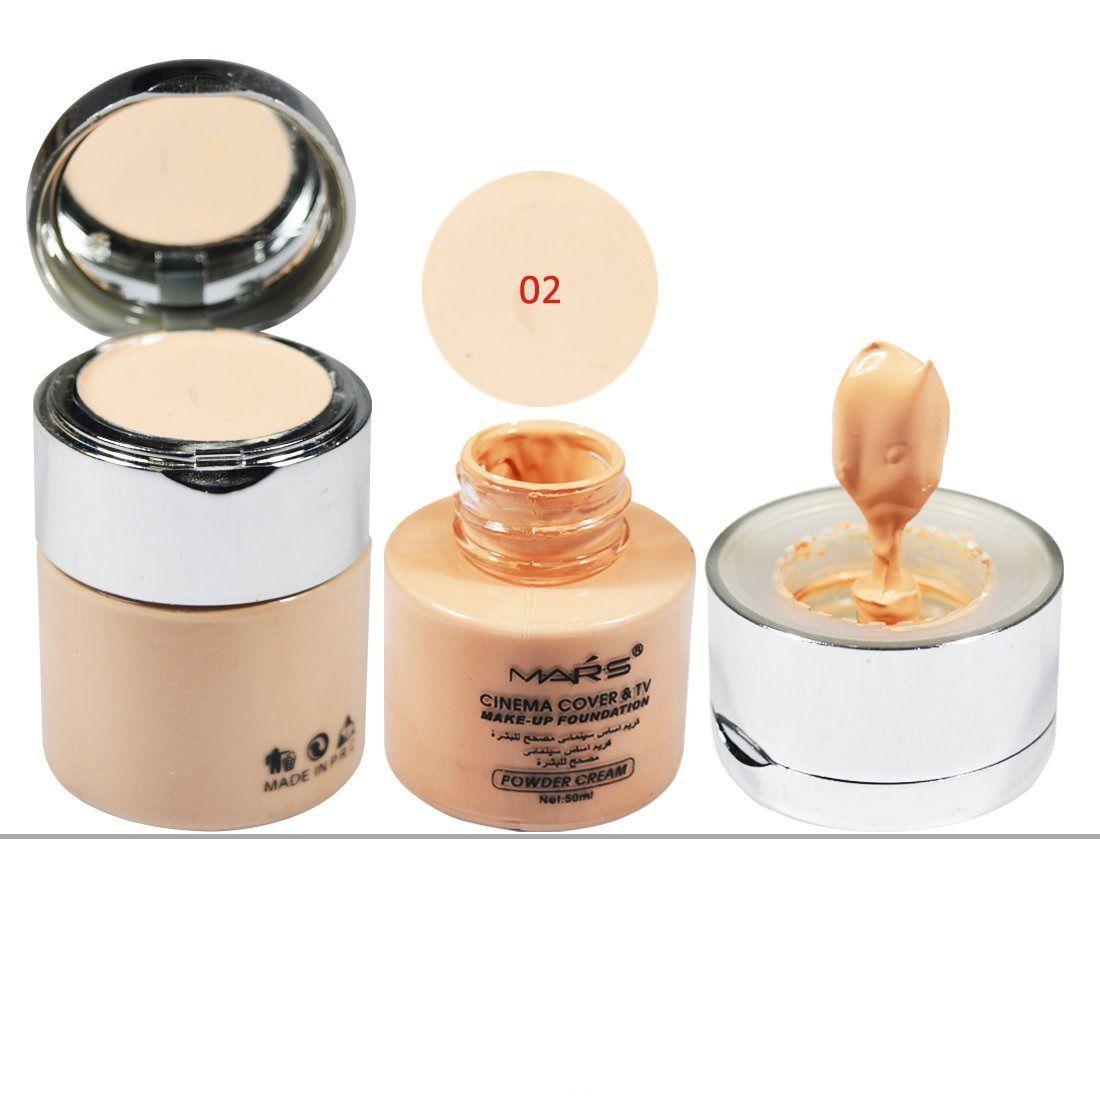 Mars Cinema Cover & TV Make-up 02 Liquid Foundation Beige 50 ml